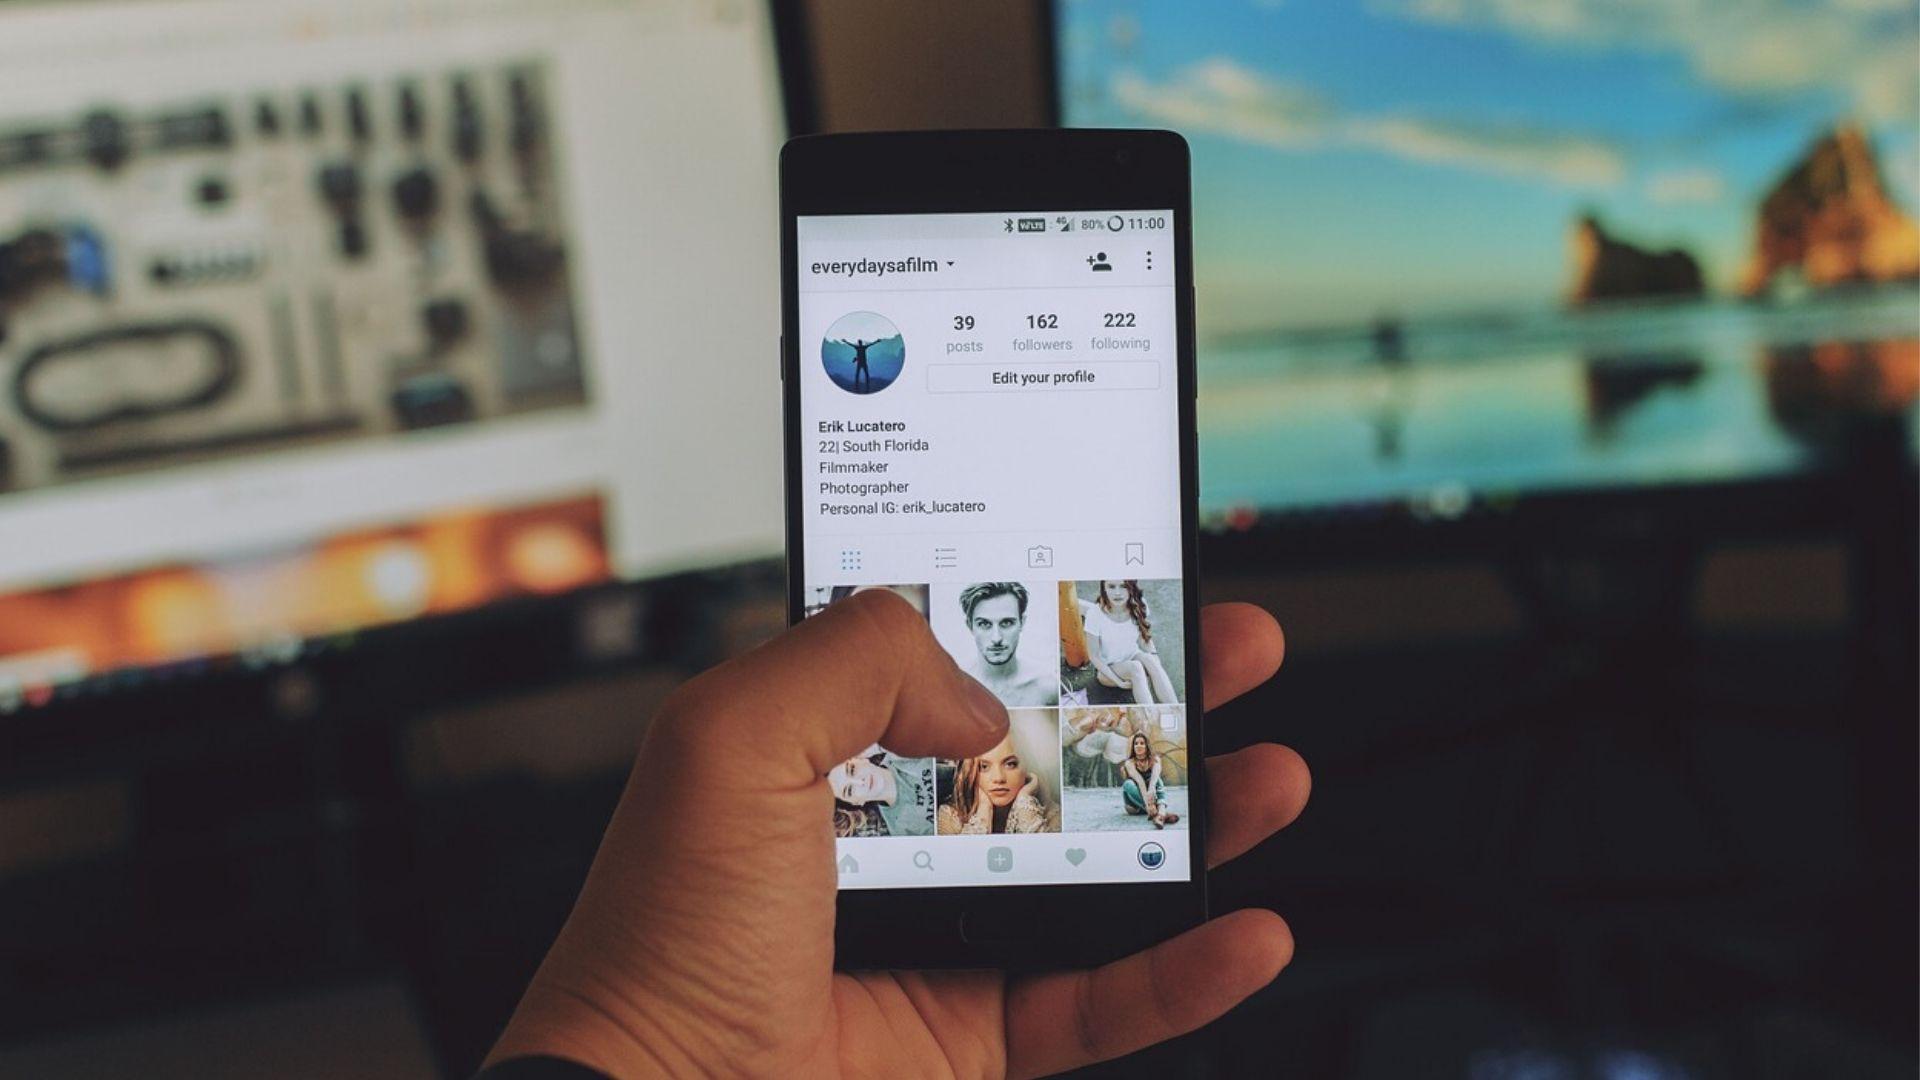 blog image - social media - guy scrolling through instagram